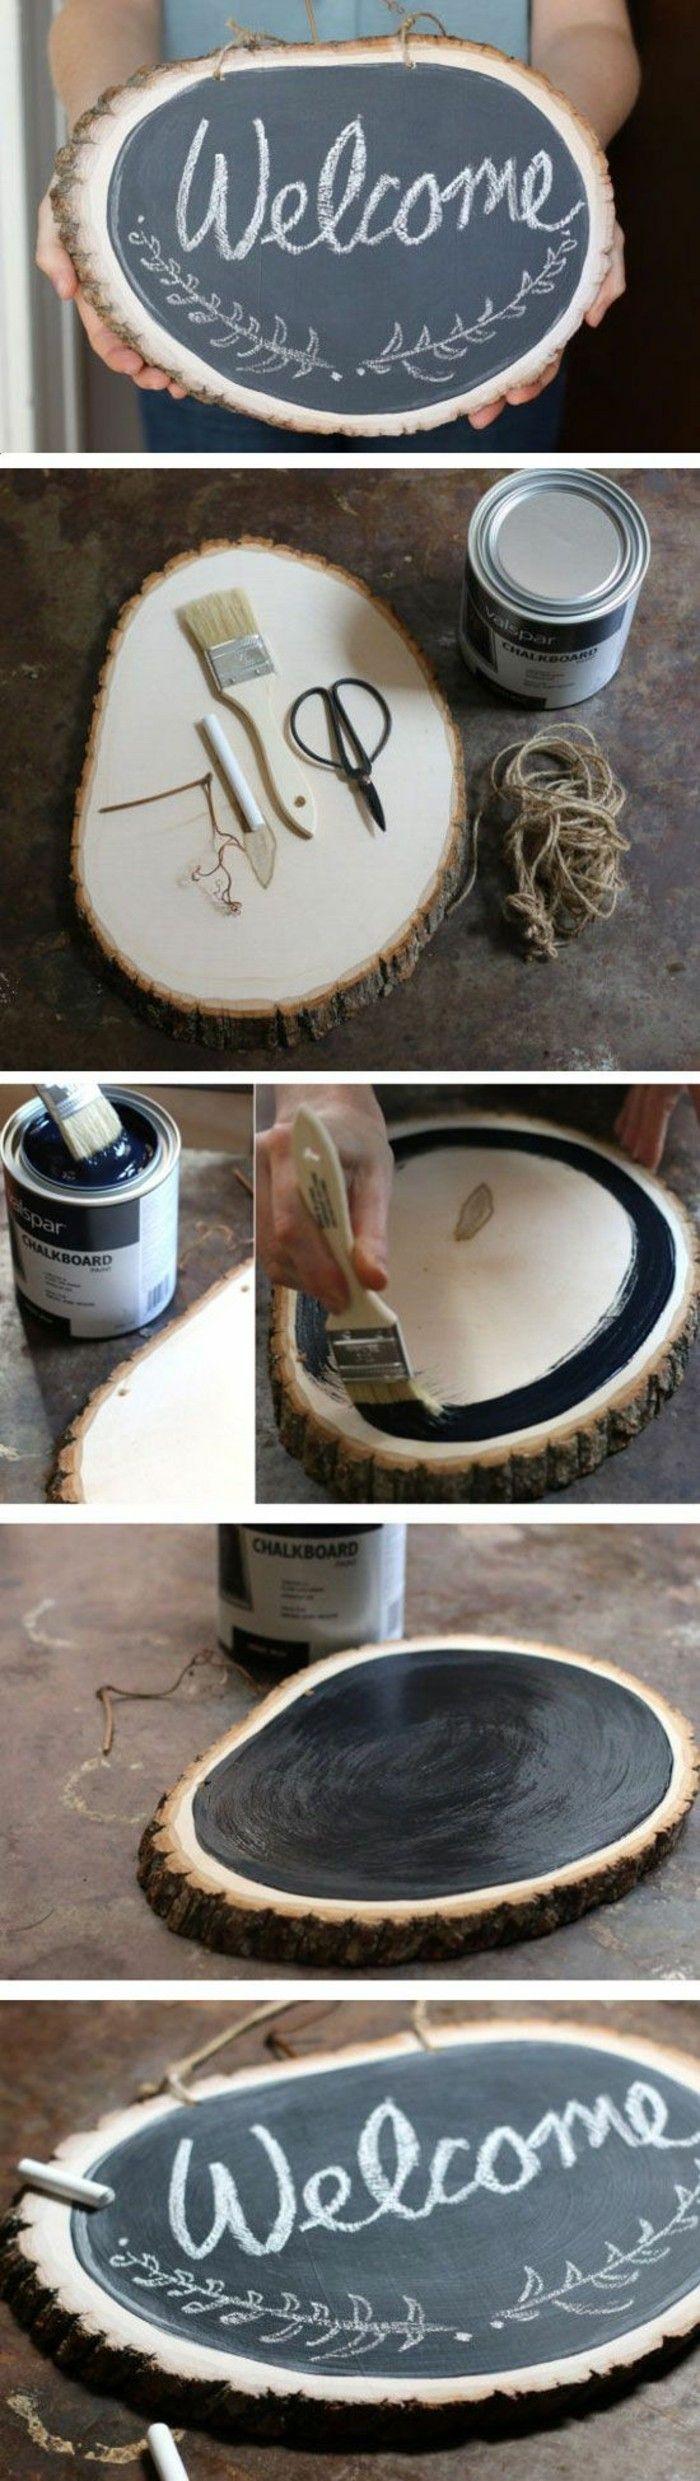 Wanddeko Selber Machen Wohnideen Selber Machen Holz Bamalen Tabelle  Willkommen